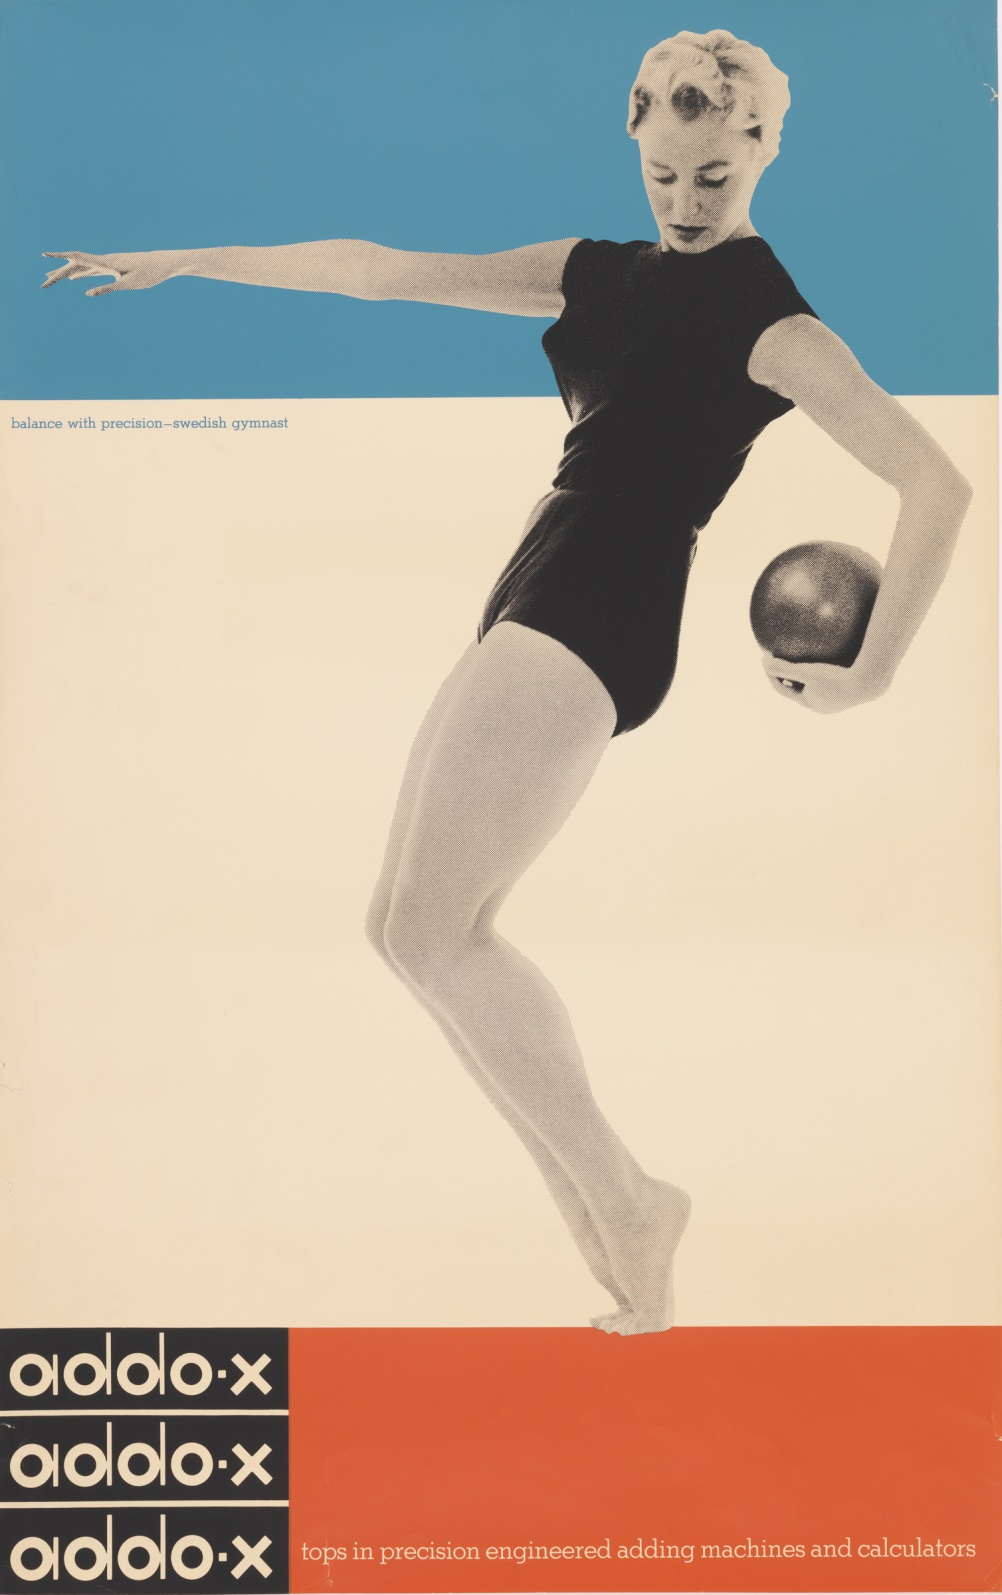 Poster for A. B. Addo by Ladislav Sutnar , 1958